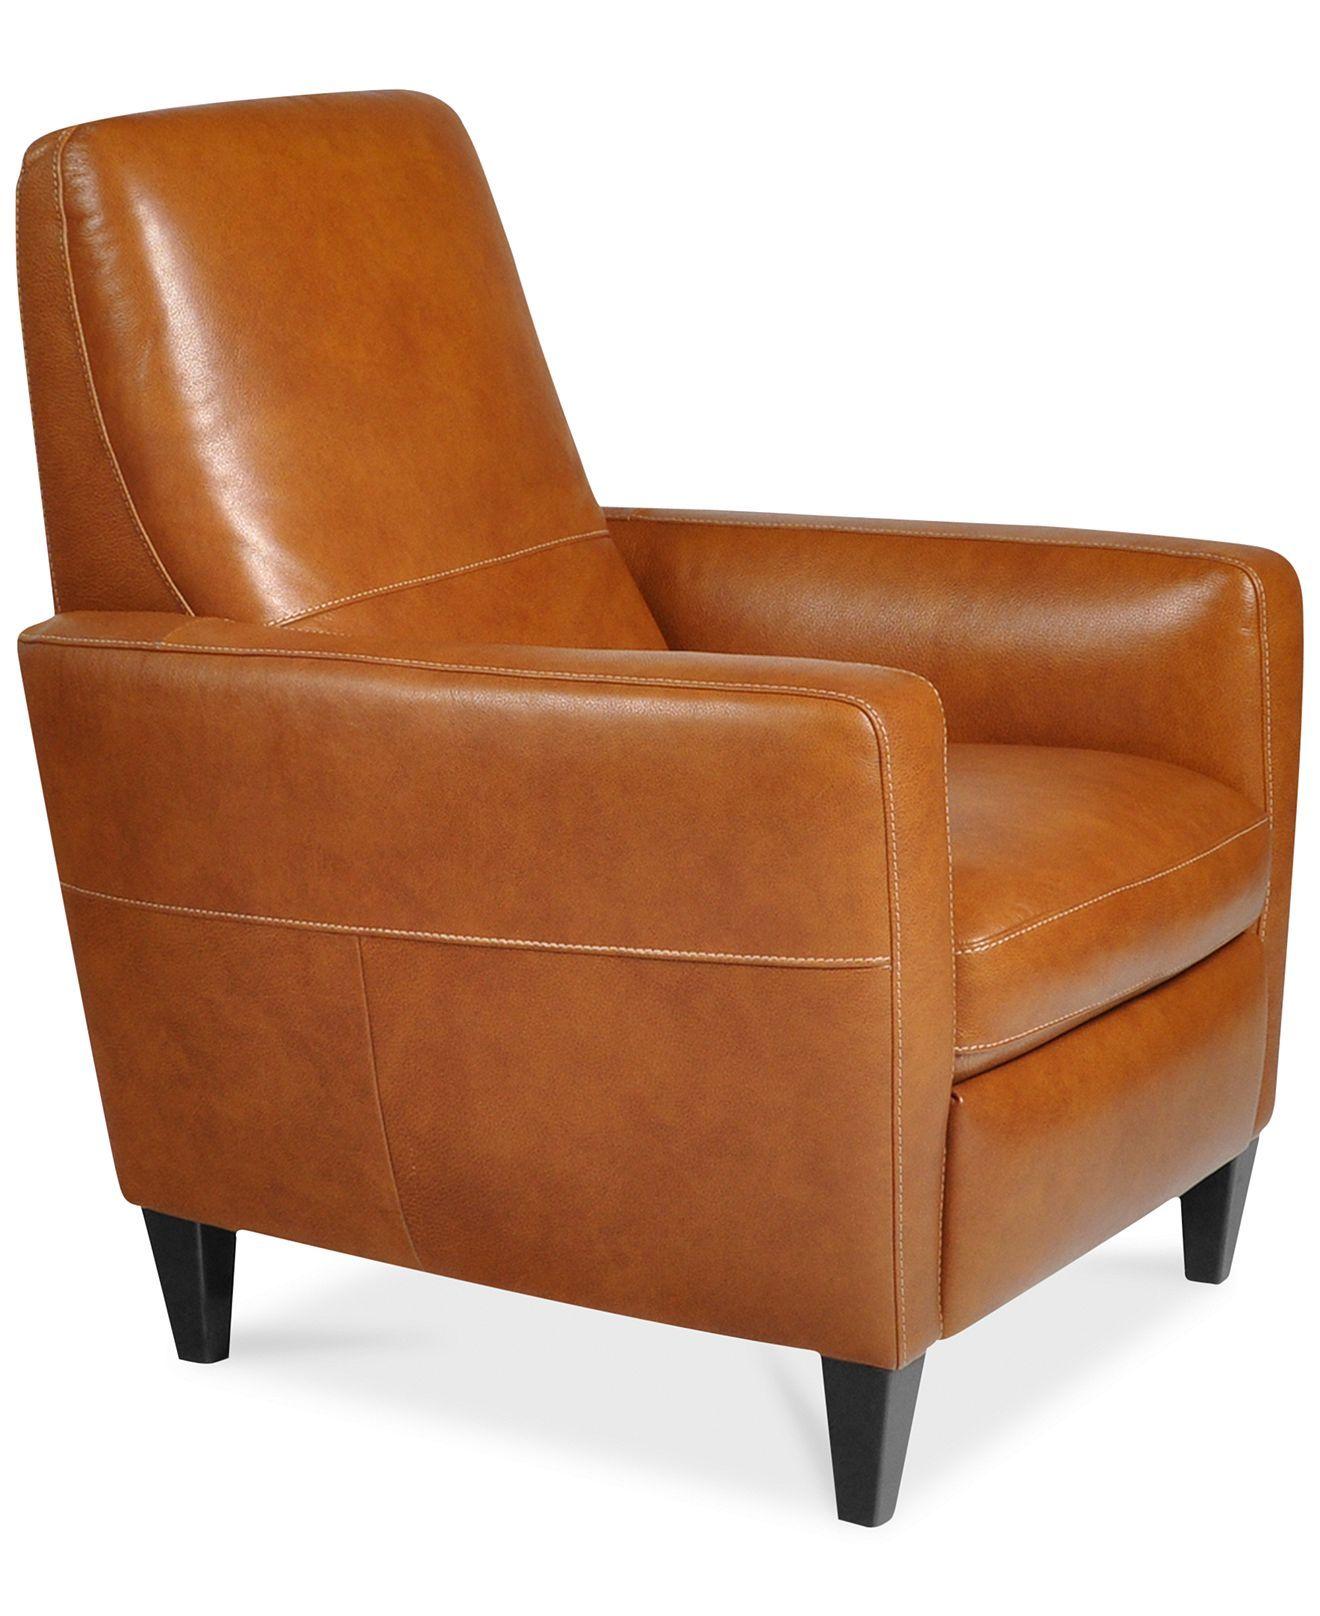 Asher Leather Recliner Chair 33 Quot W X 39 Quot D X 42 Quot H